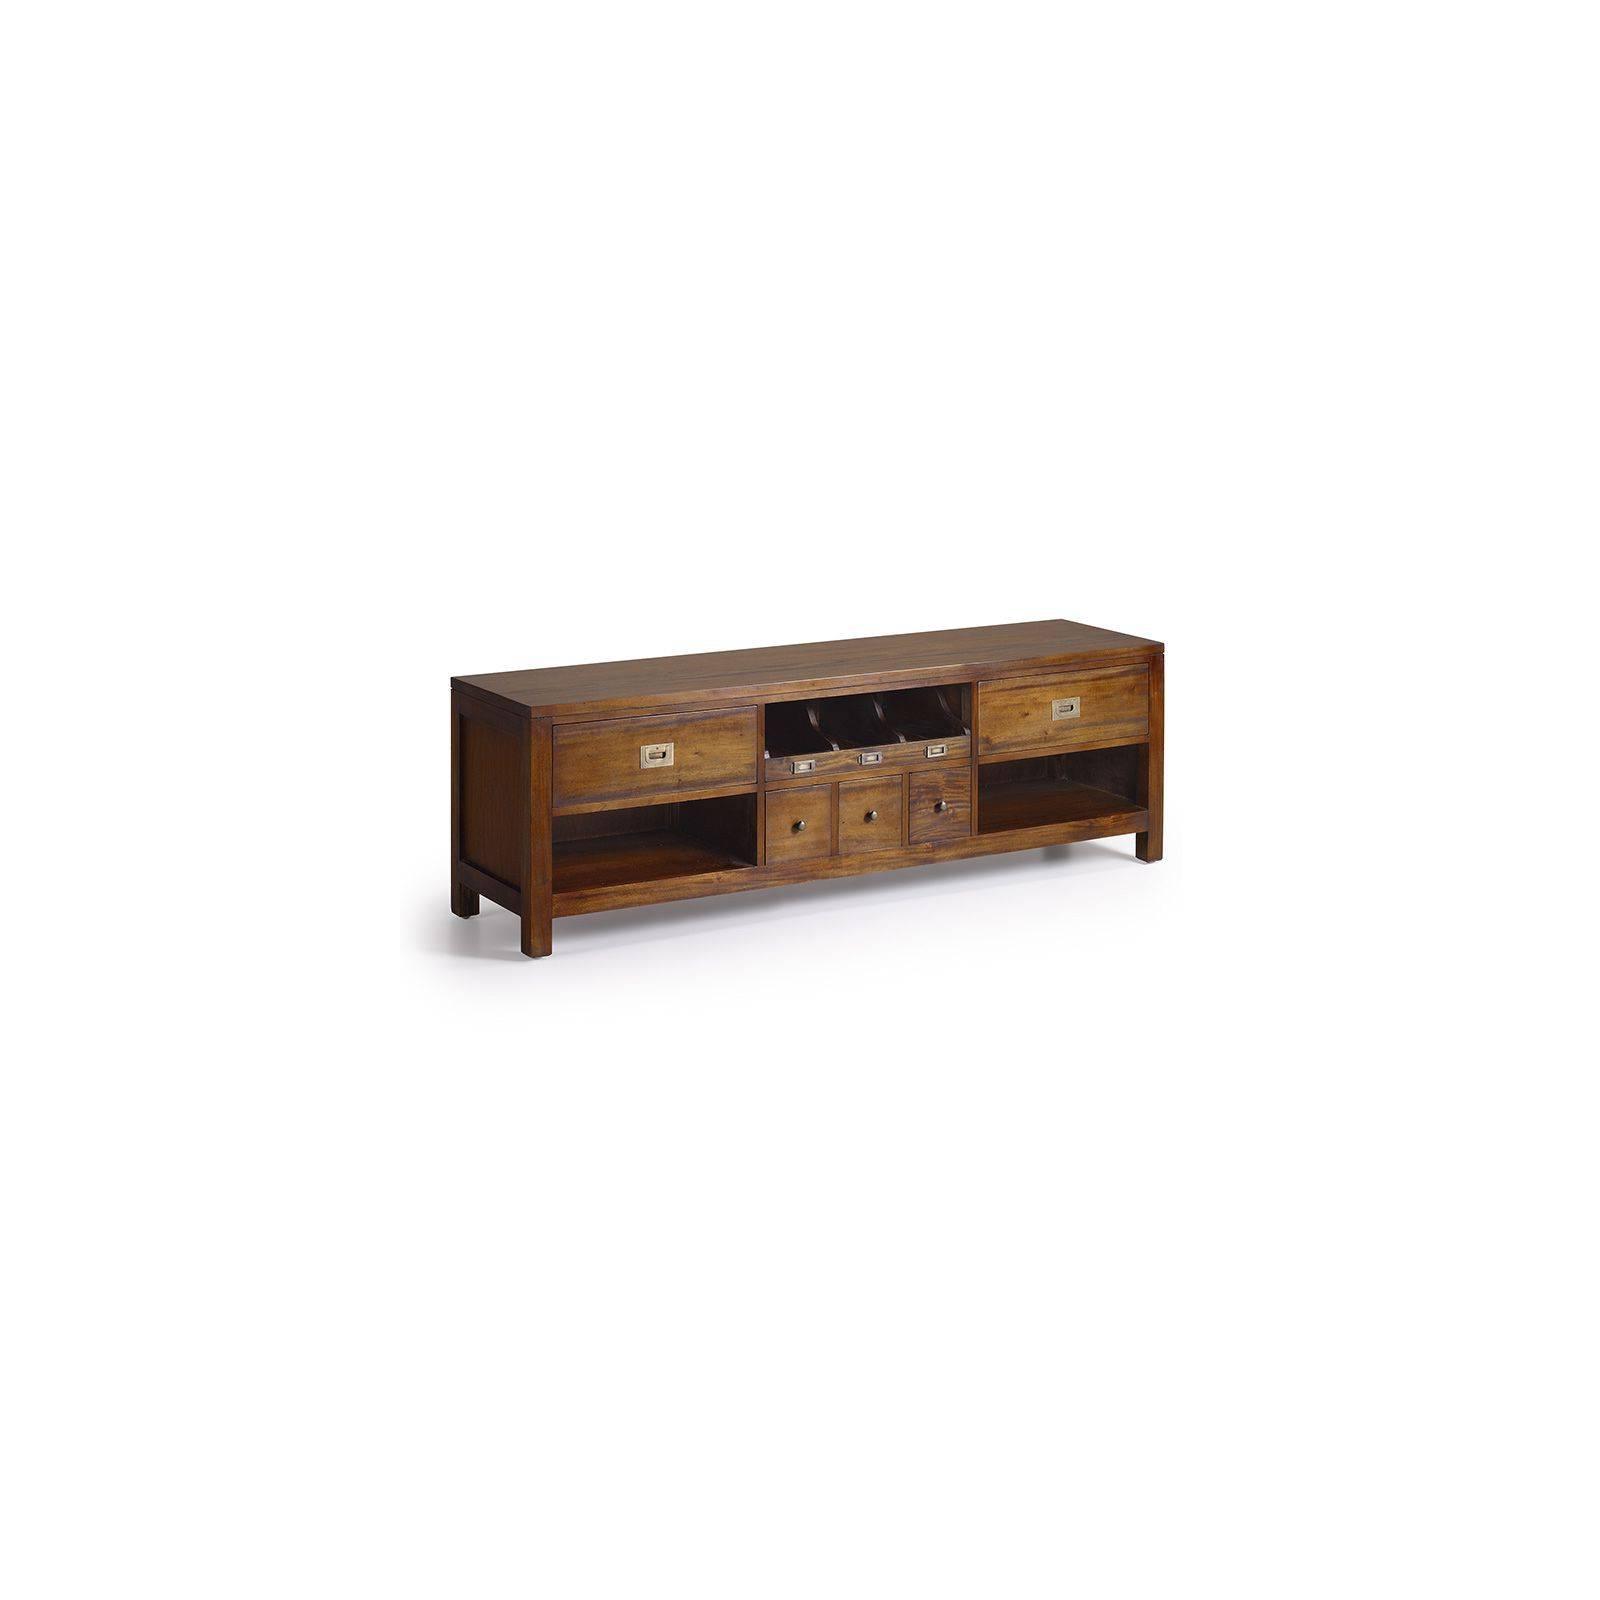 Meuble Tv range CD Colonial Acajou Massif - achat meuble Tv